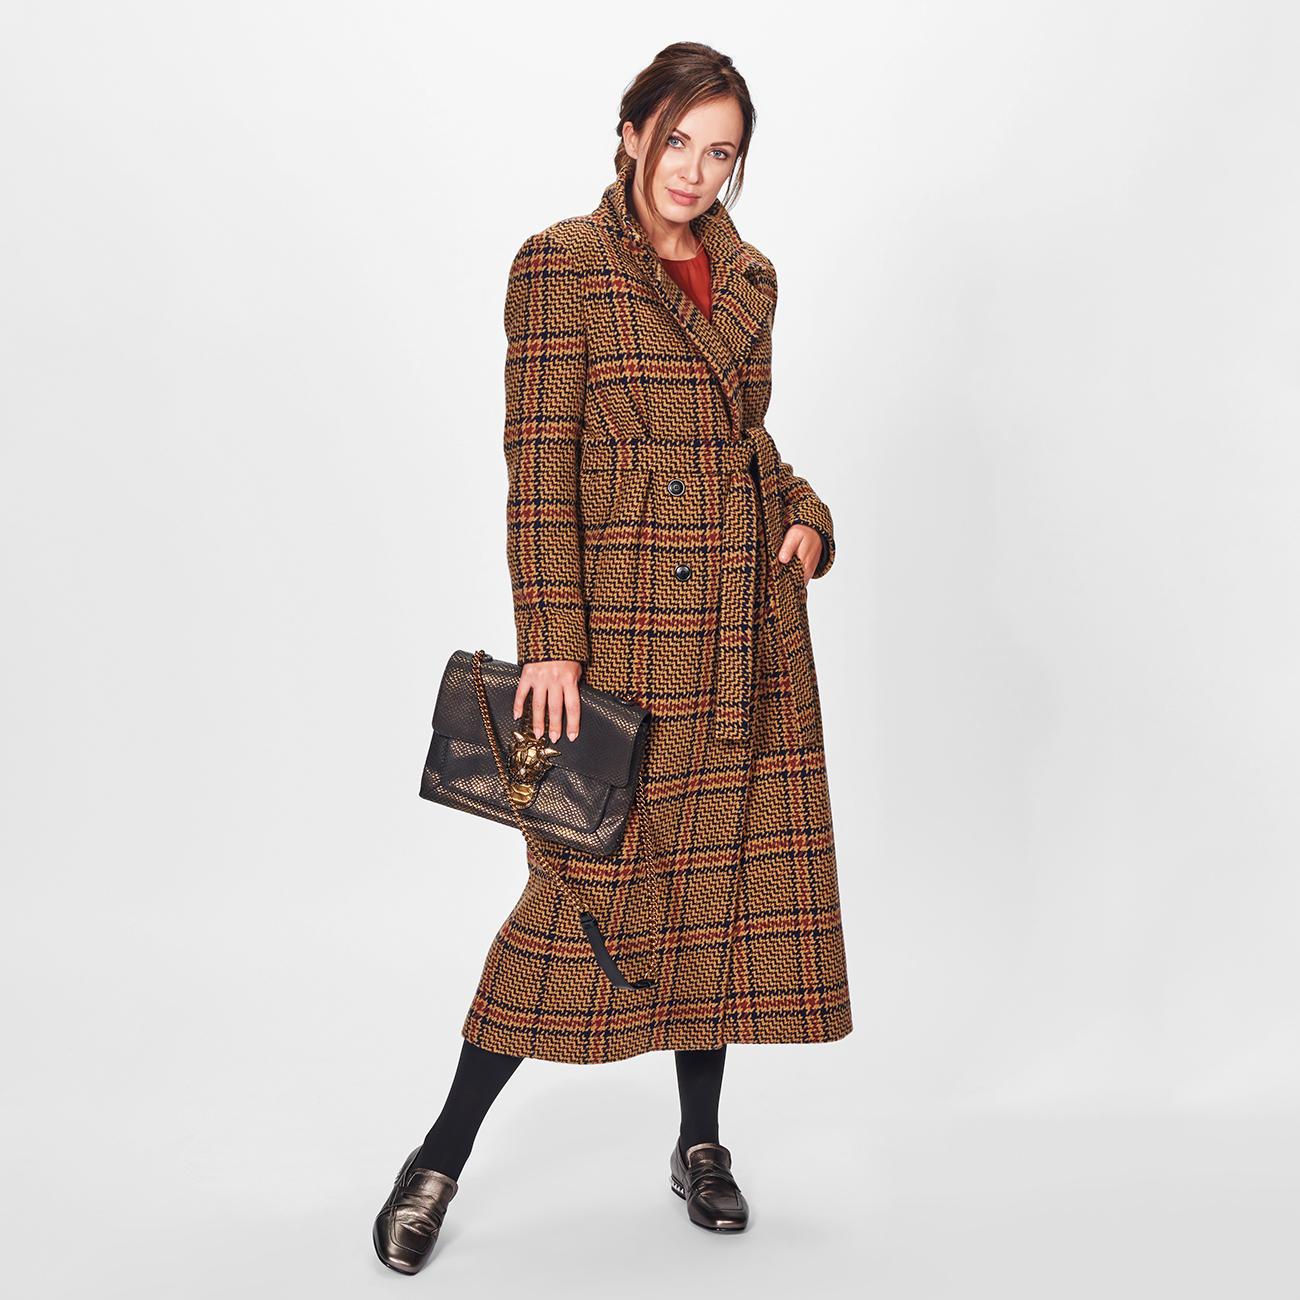 Mode Glencheck Mantel TWINSET FlatterkleidDesigner oder Nnvm8w0